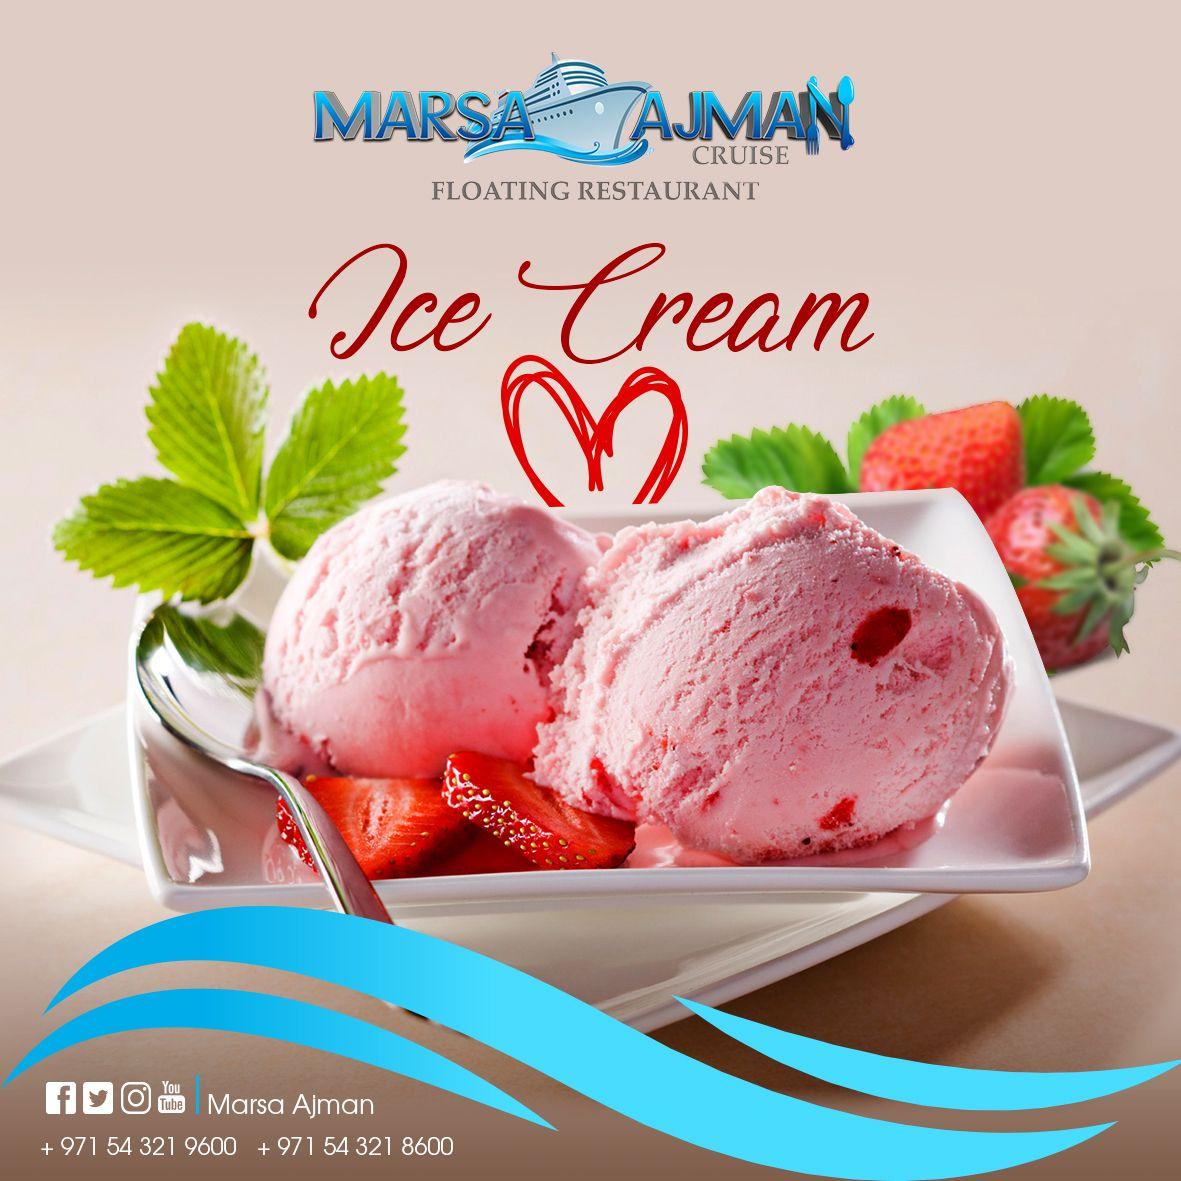 مفيش احلي من الأيس كريم في مكان رائع زي مرسي عجمان مينشن لـ شخص بتحب تاكل معاه ايس كريم Marsaajmancruise Floating Restaurant Food Desserts Ice Cream